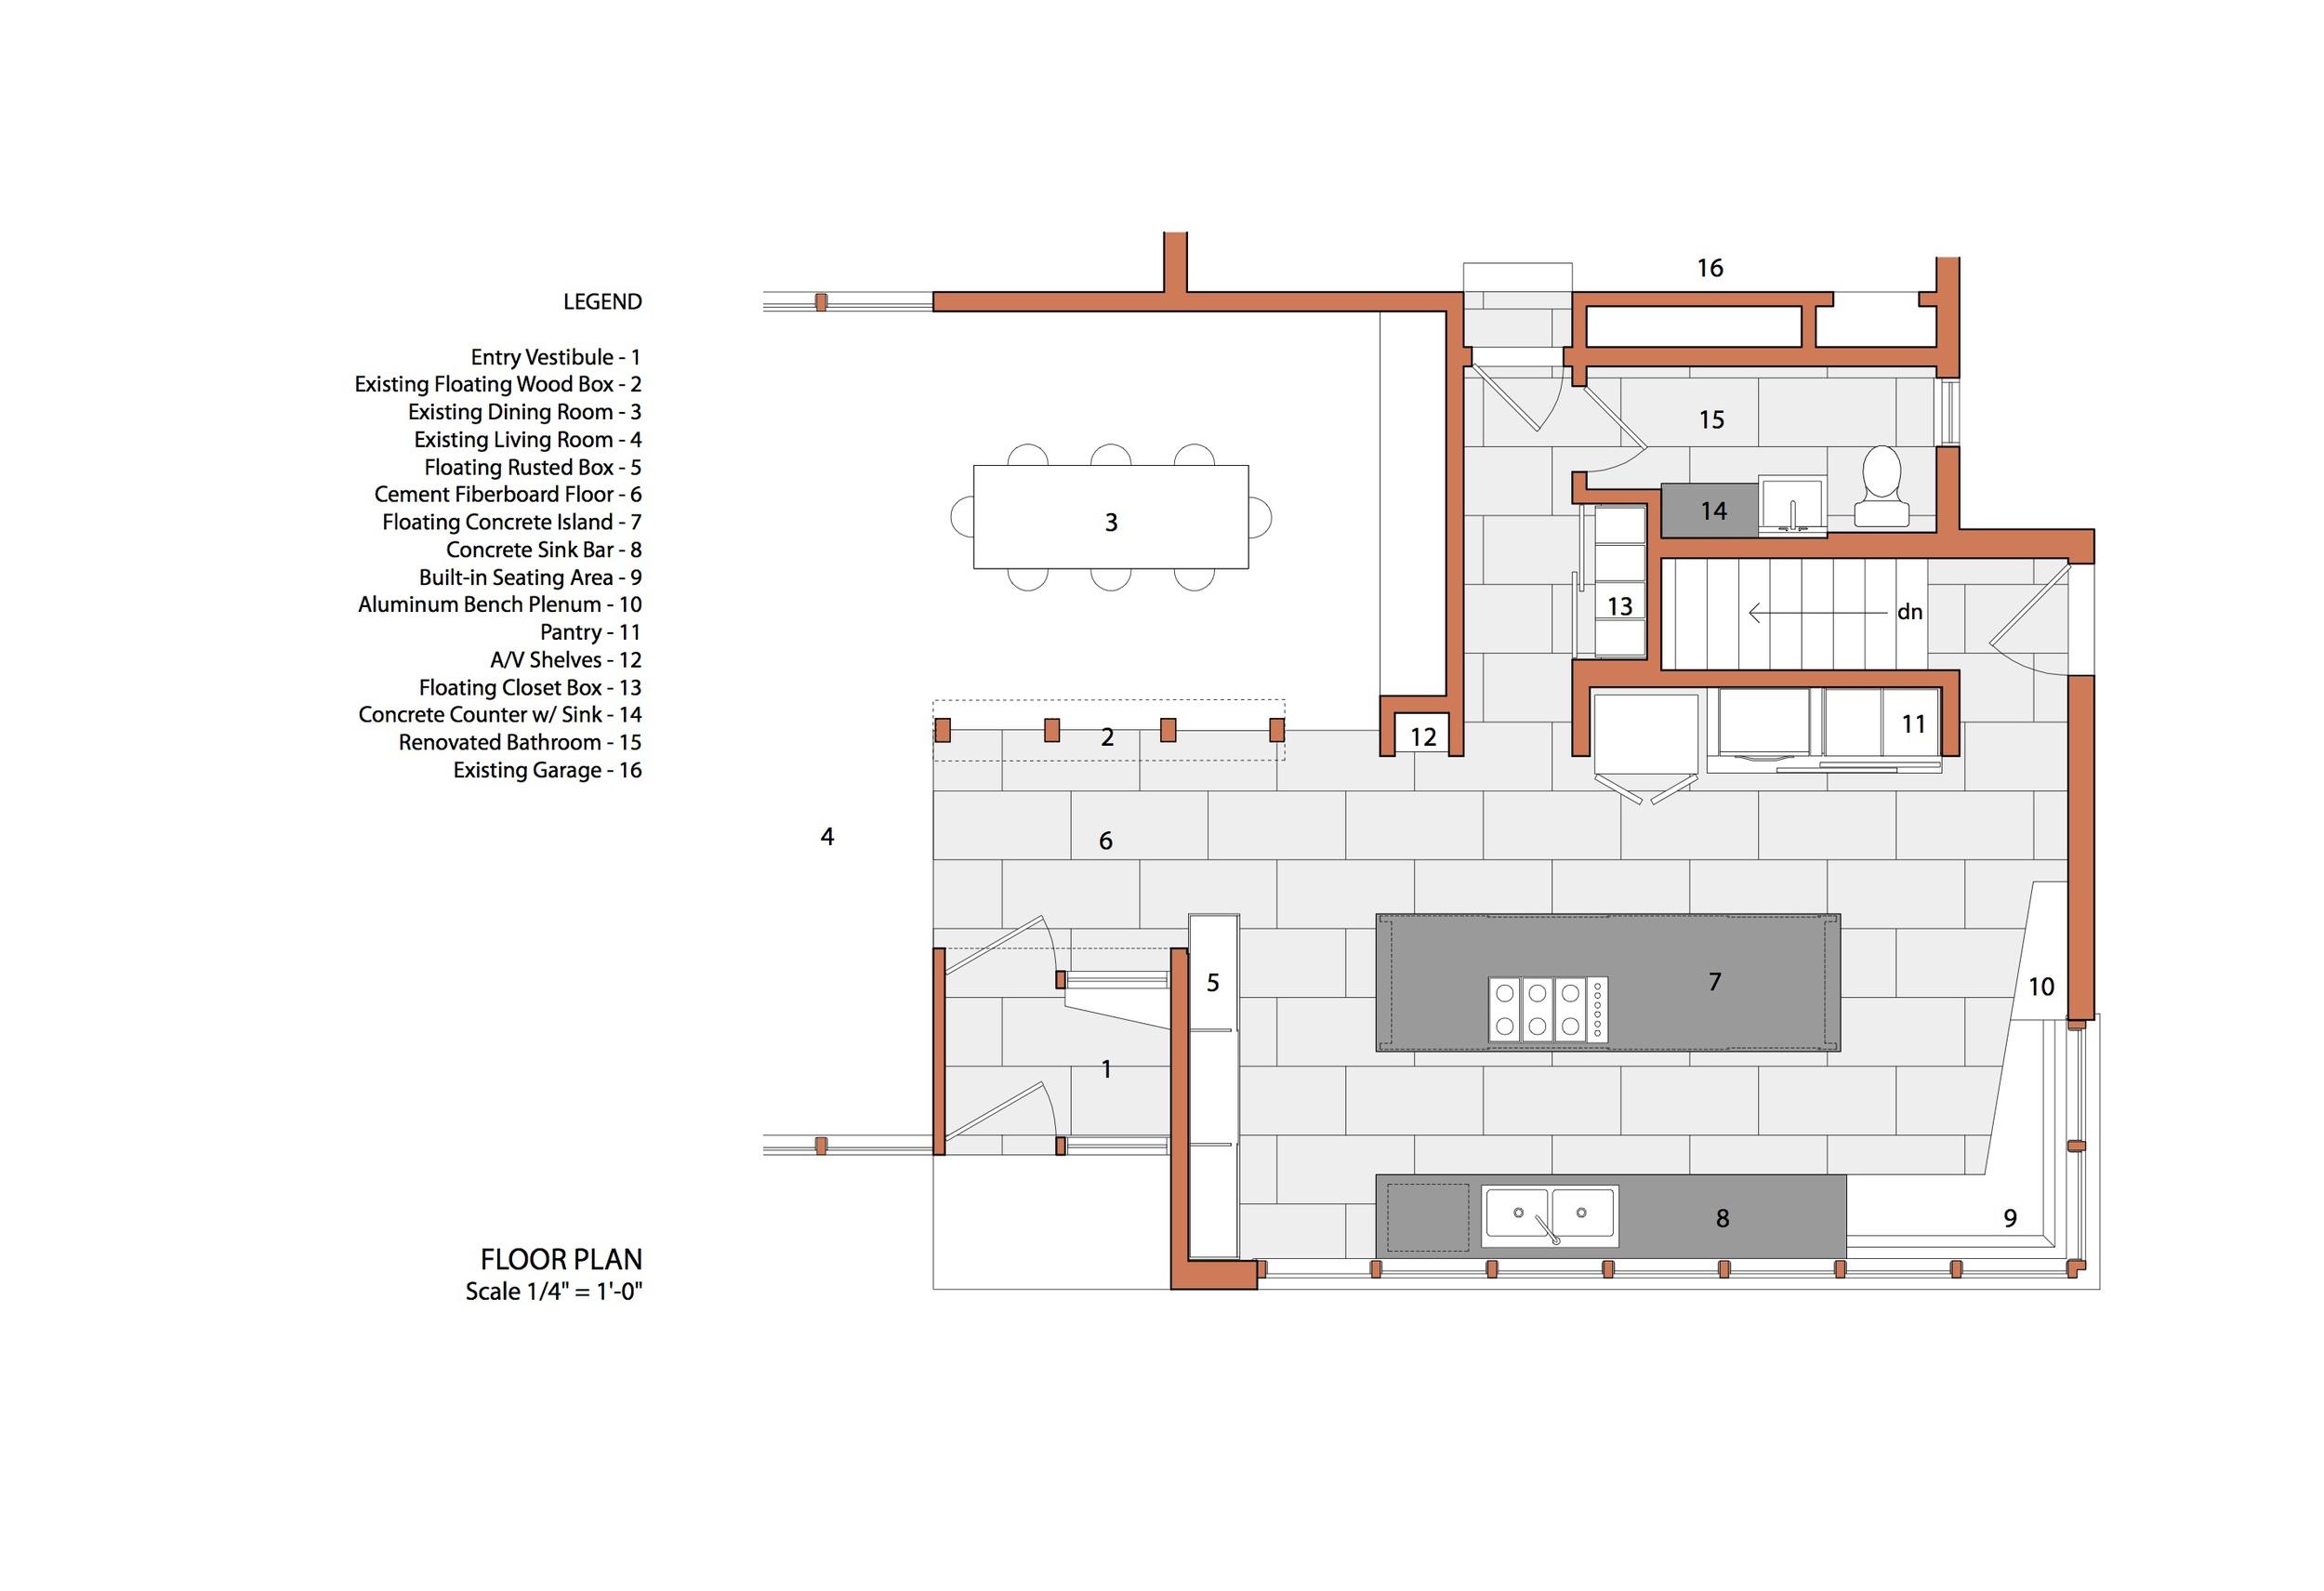 floor_plan_06-27-05_final_image.jpg